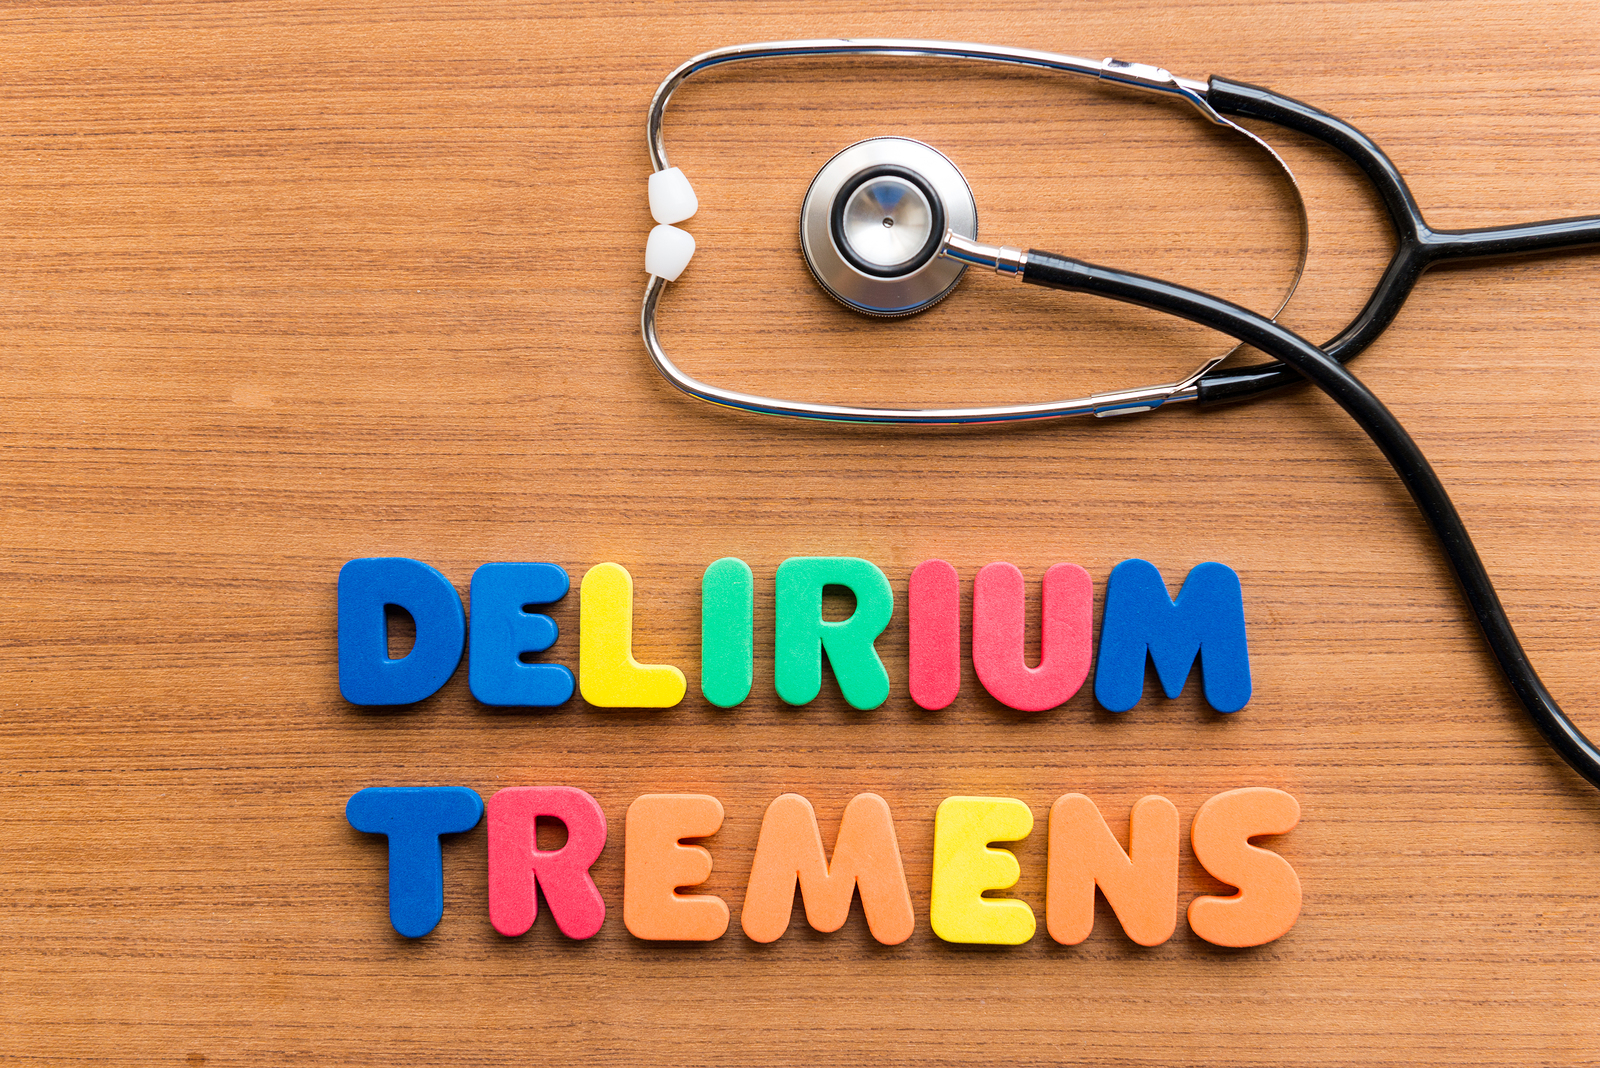 Delirium Tremens and Marijuana Information: Treat Delirium Tremens With Cannabis